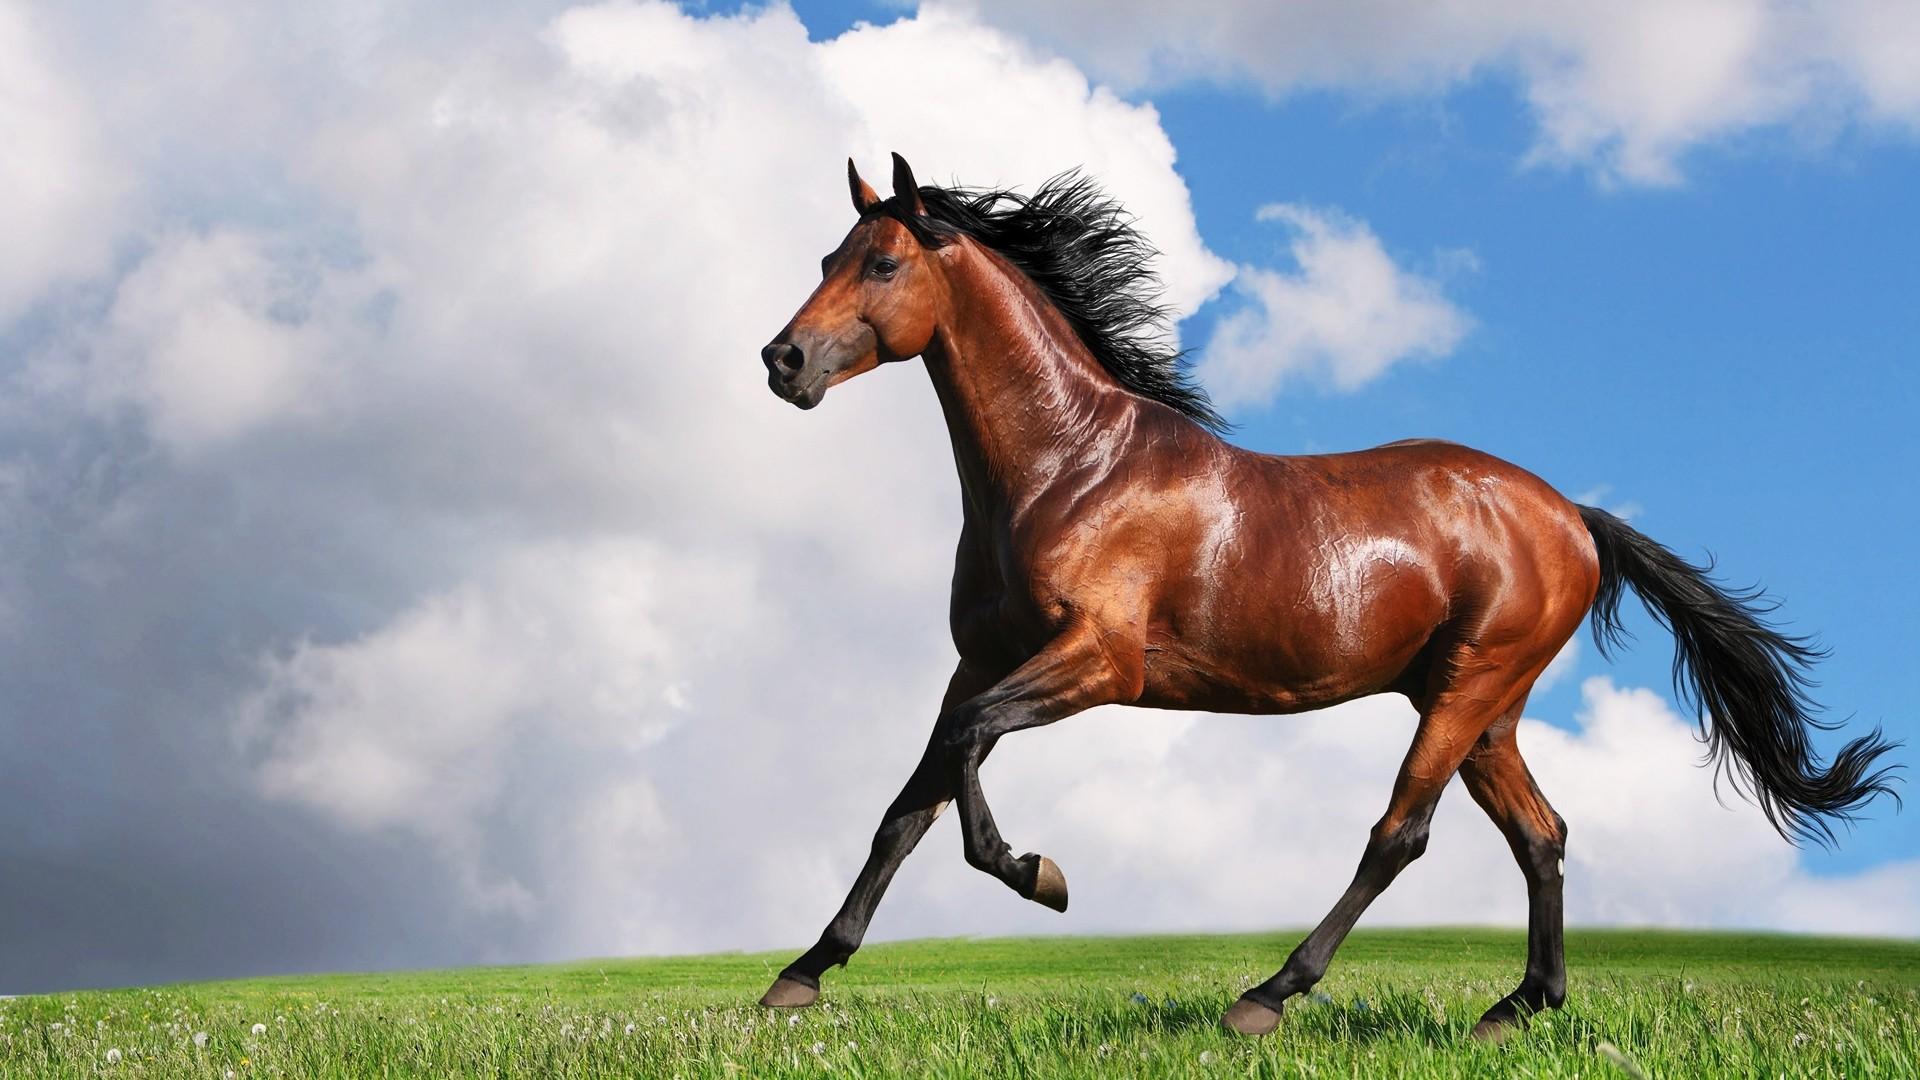 Arabian Horse Wallpaper Posted By Sarah Walker